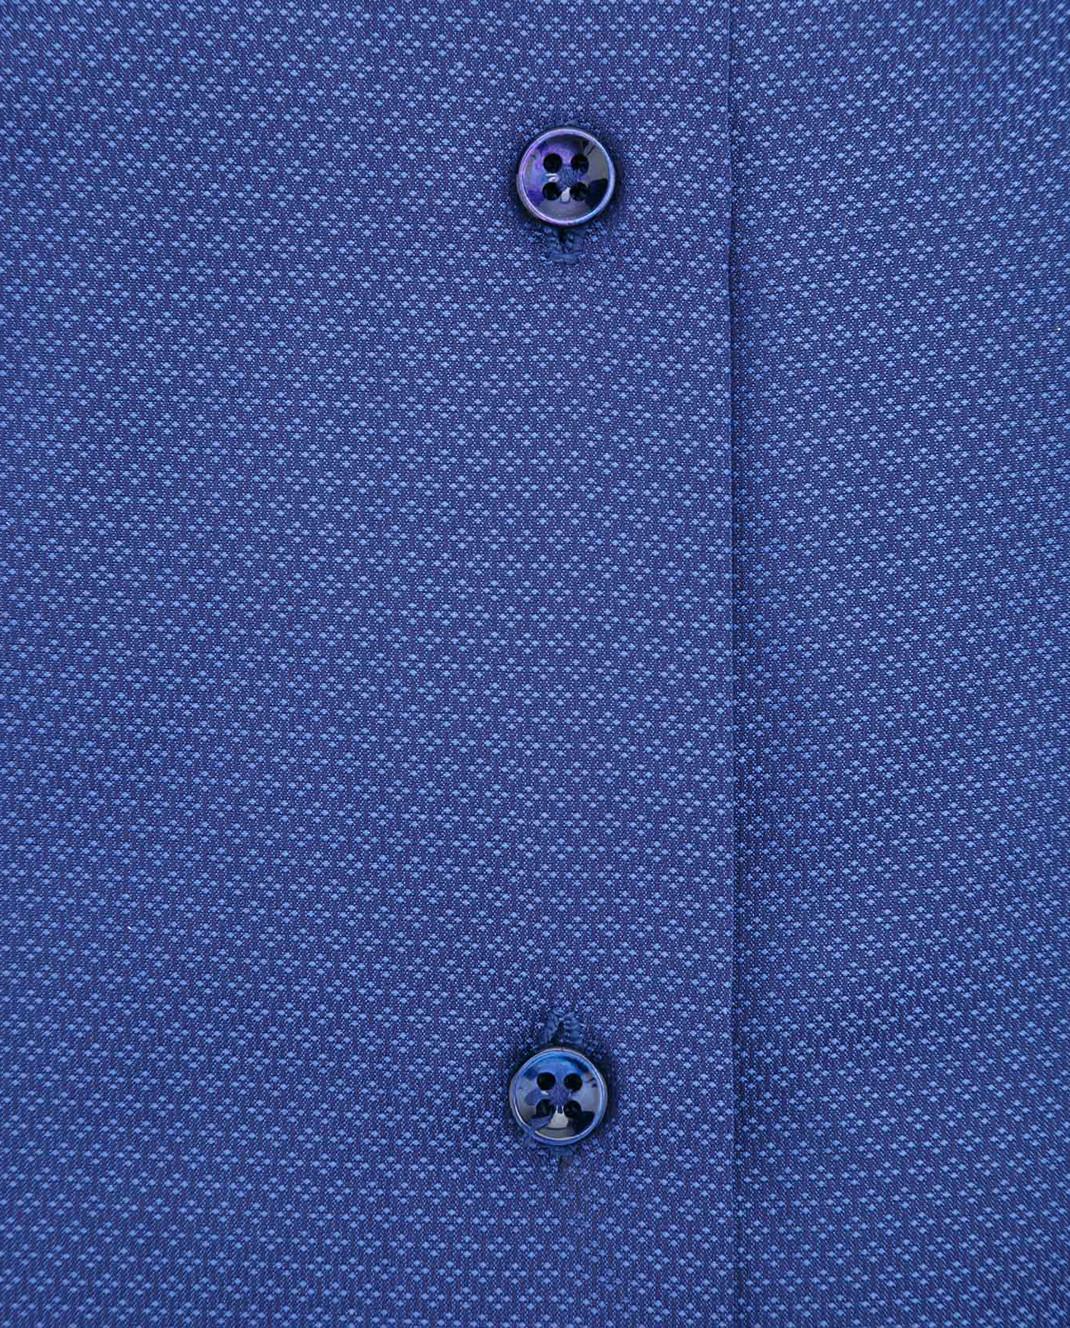 Marol Темно-синяя рубашка 8352 изображение 3